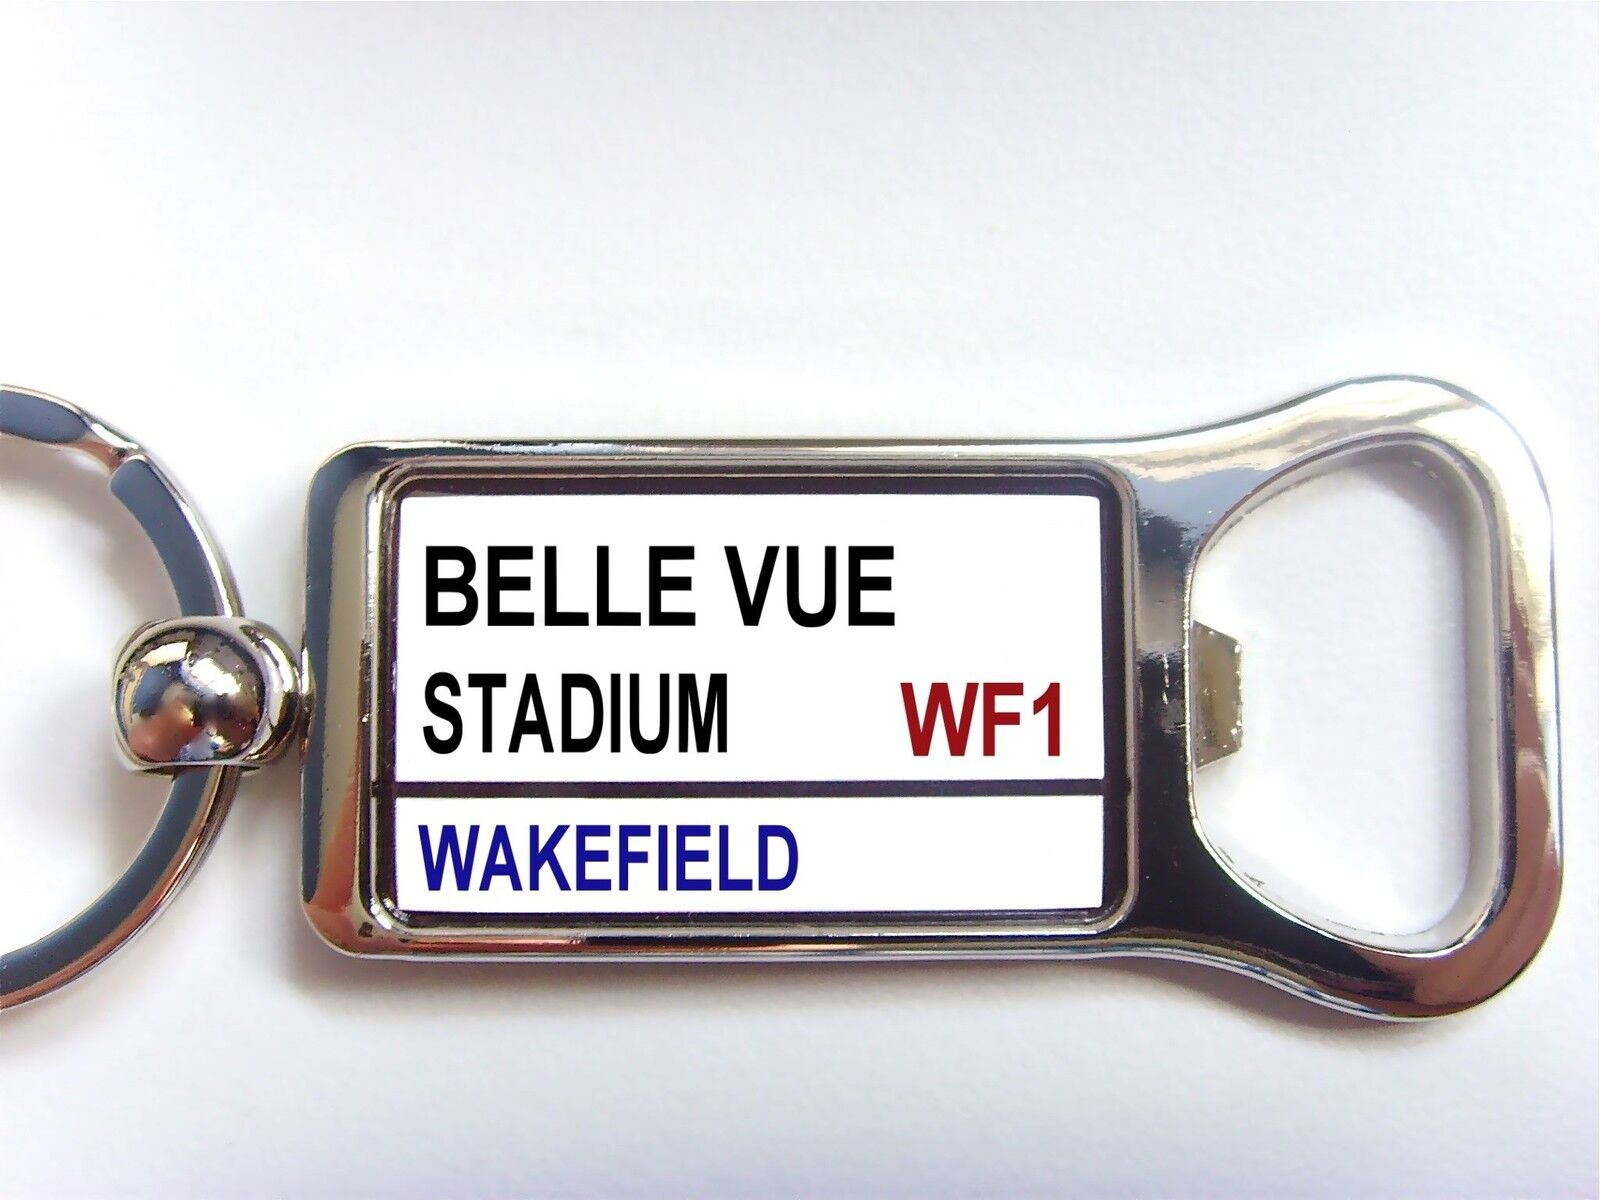 Wakefield Wildcats stade badge Street Signe Signe Street ouvre-bouteille Porte-clés Cadeau d7b8f4